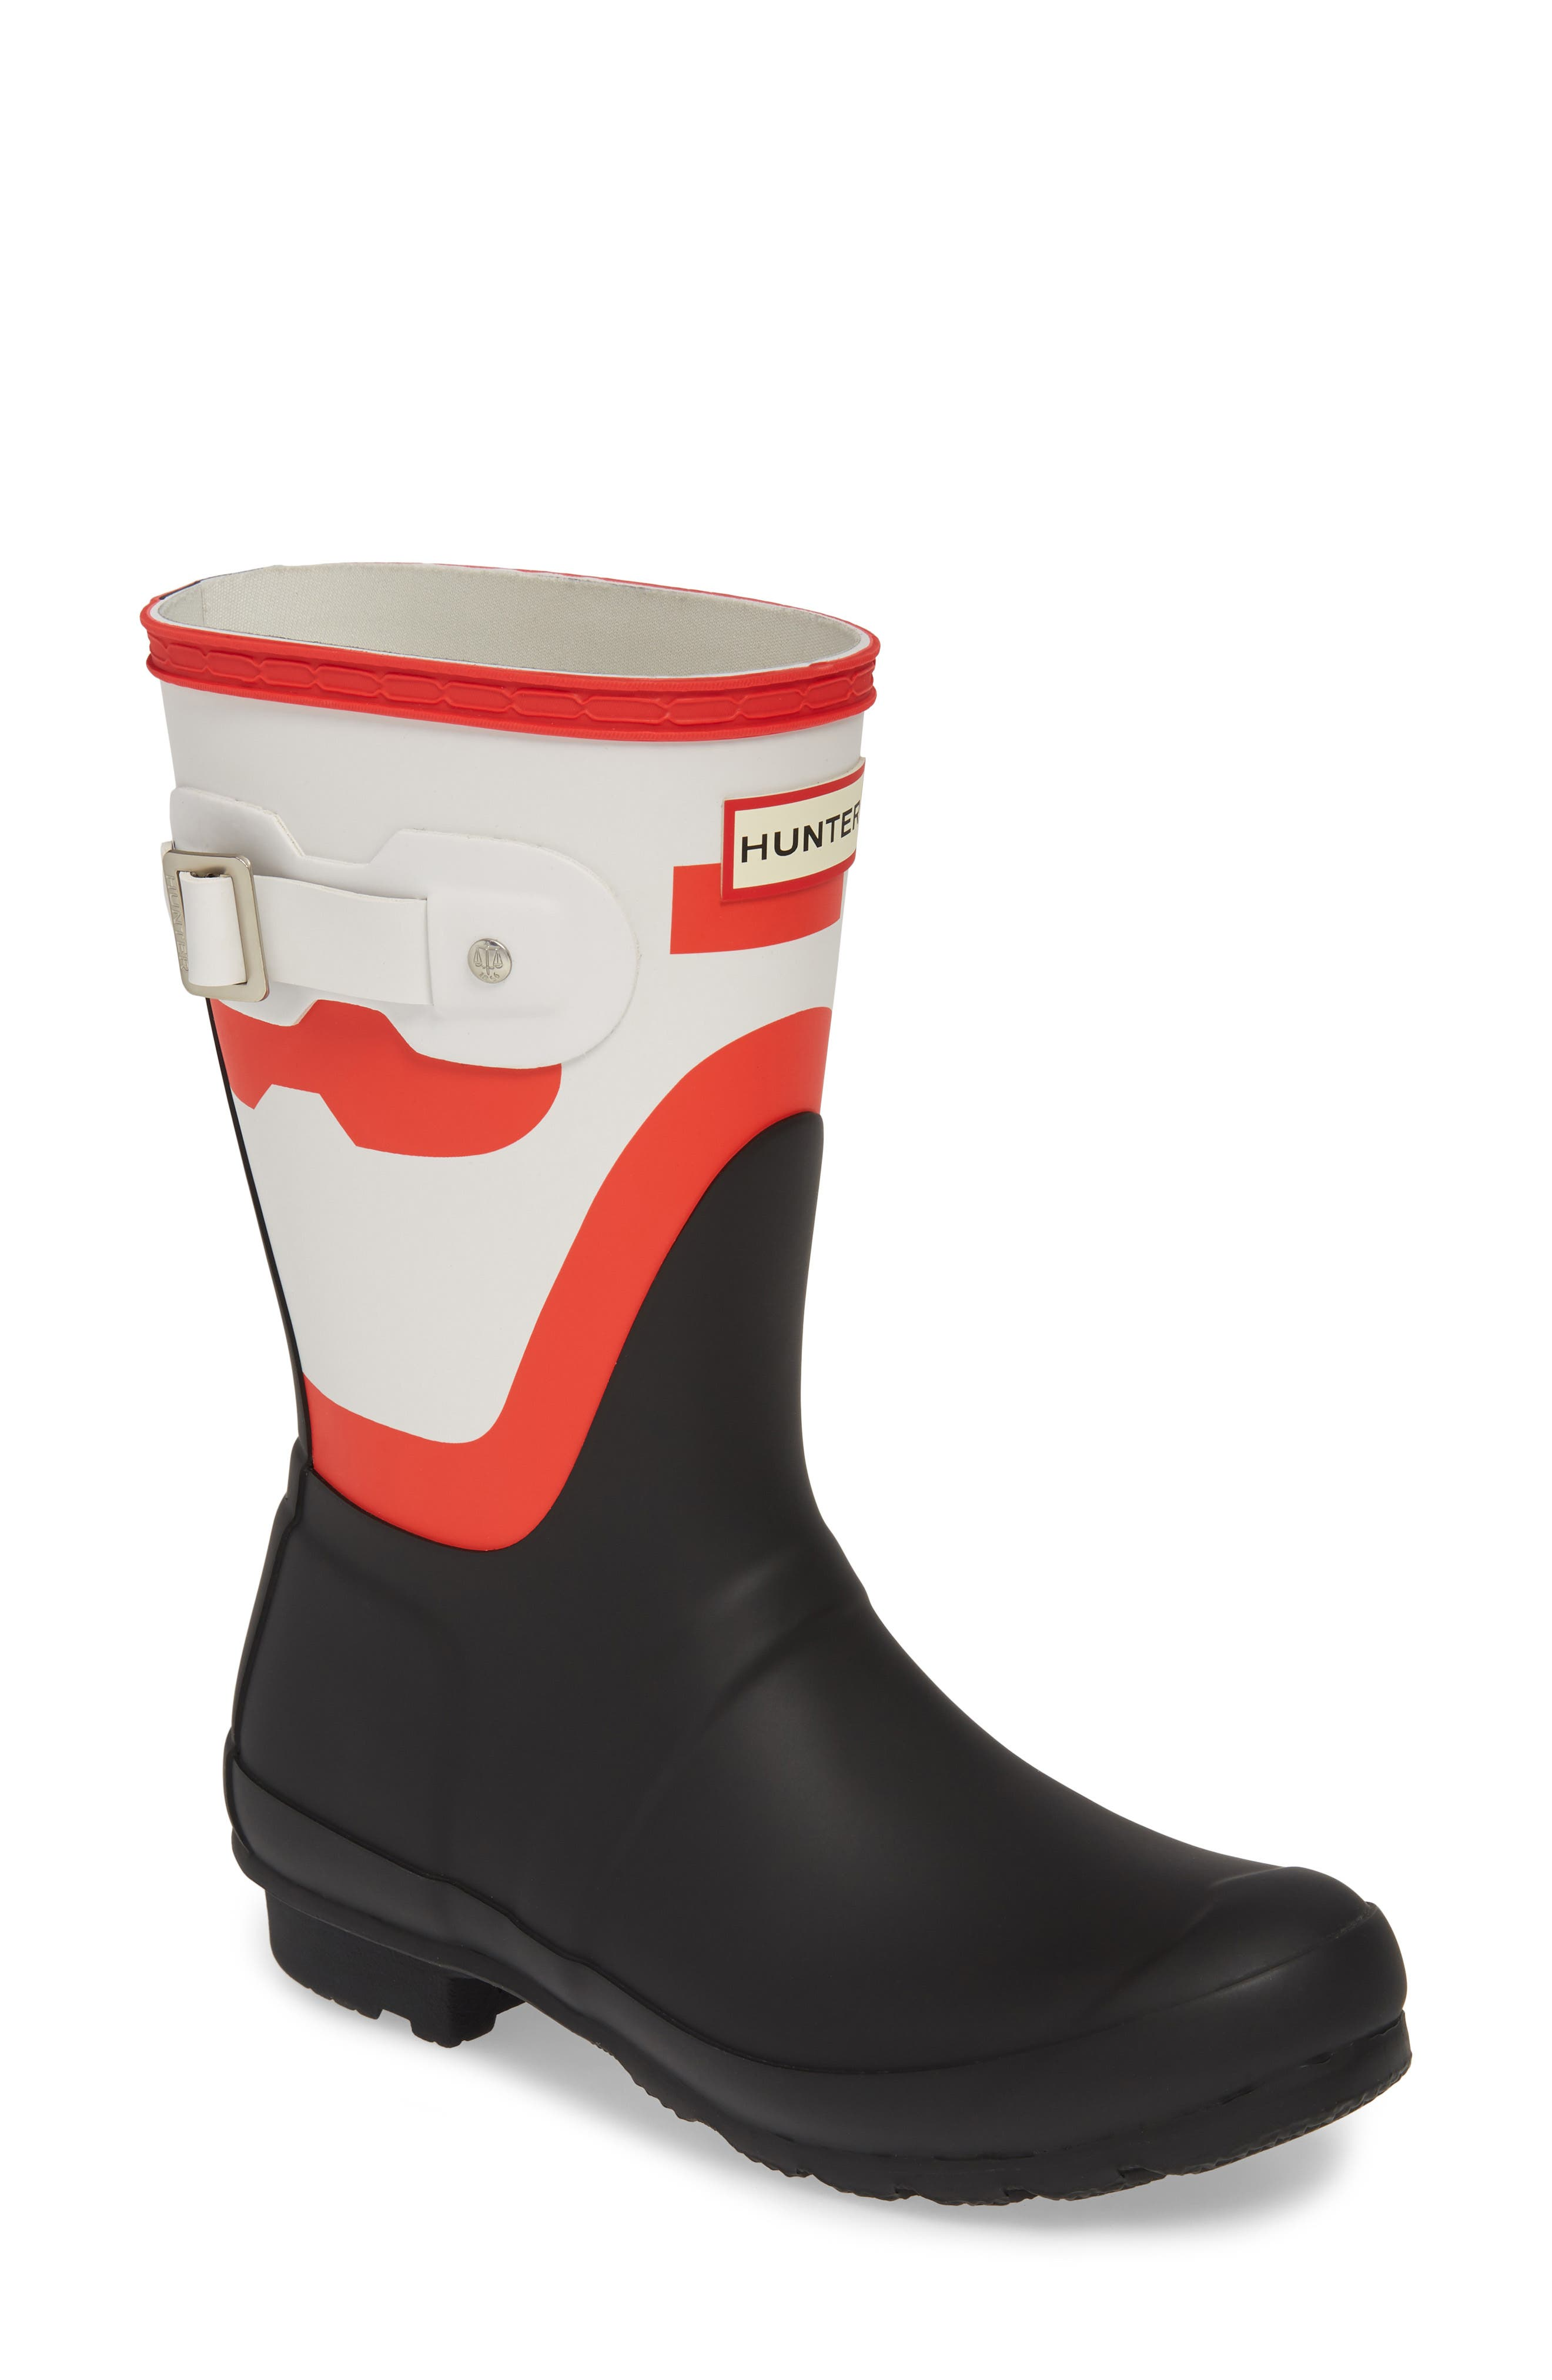 Hunter Original Shadow Print Short Waterproof Rain Boot, Black